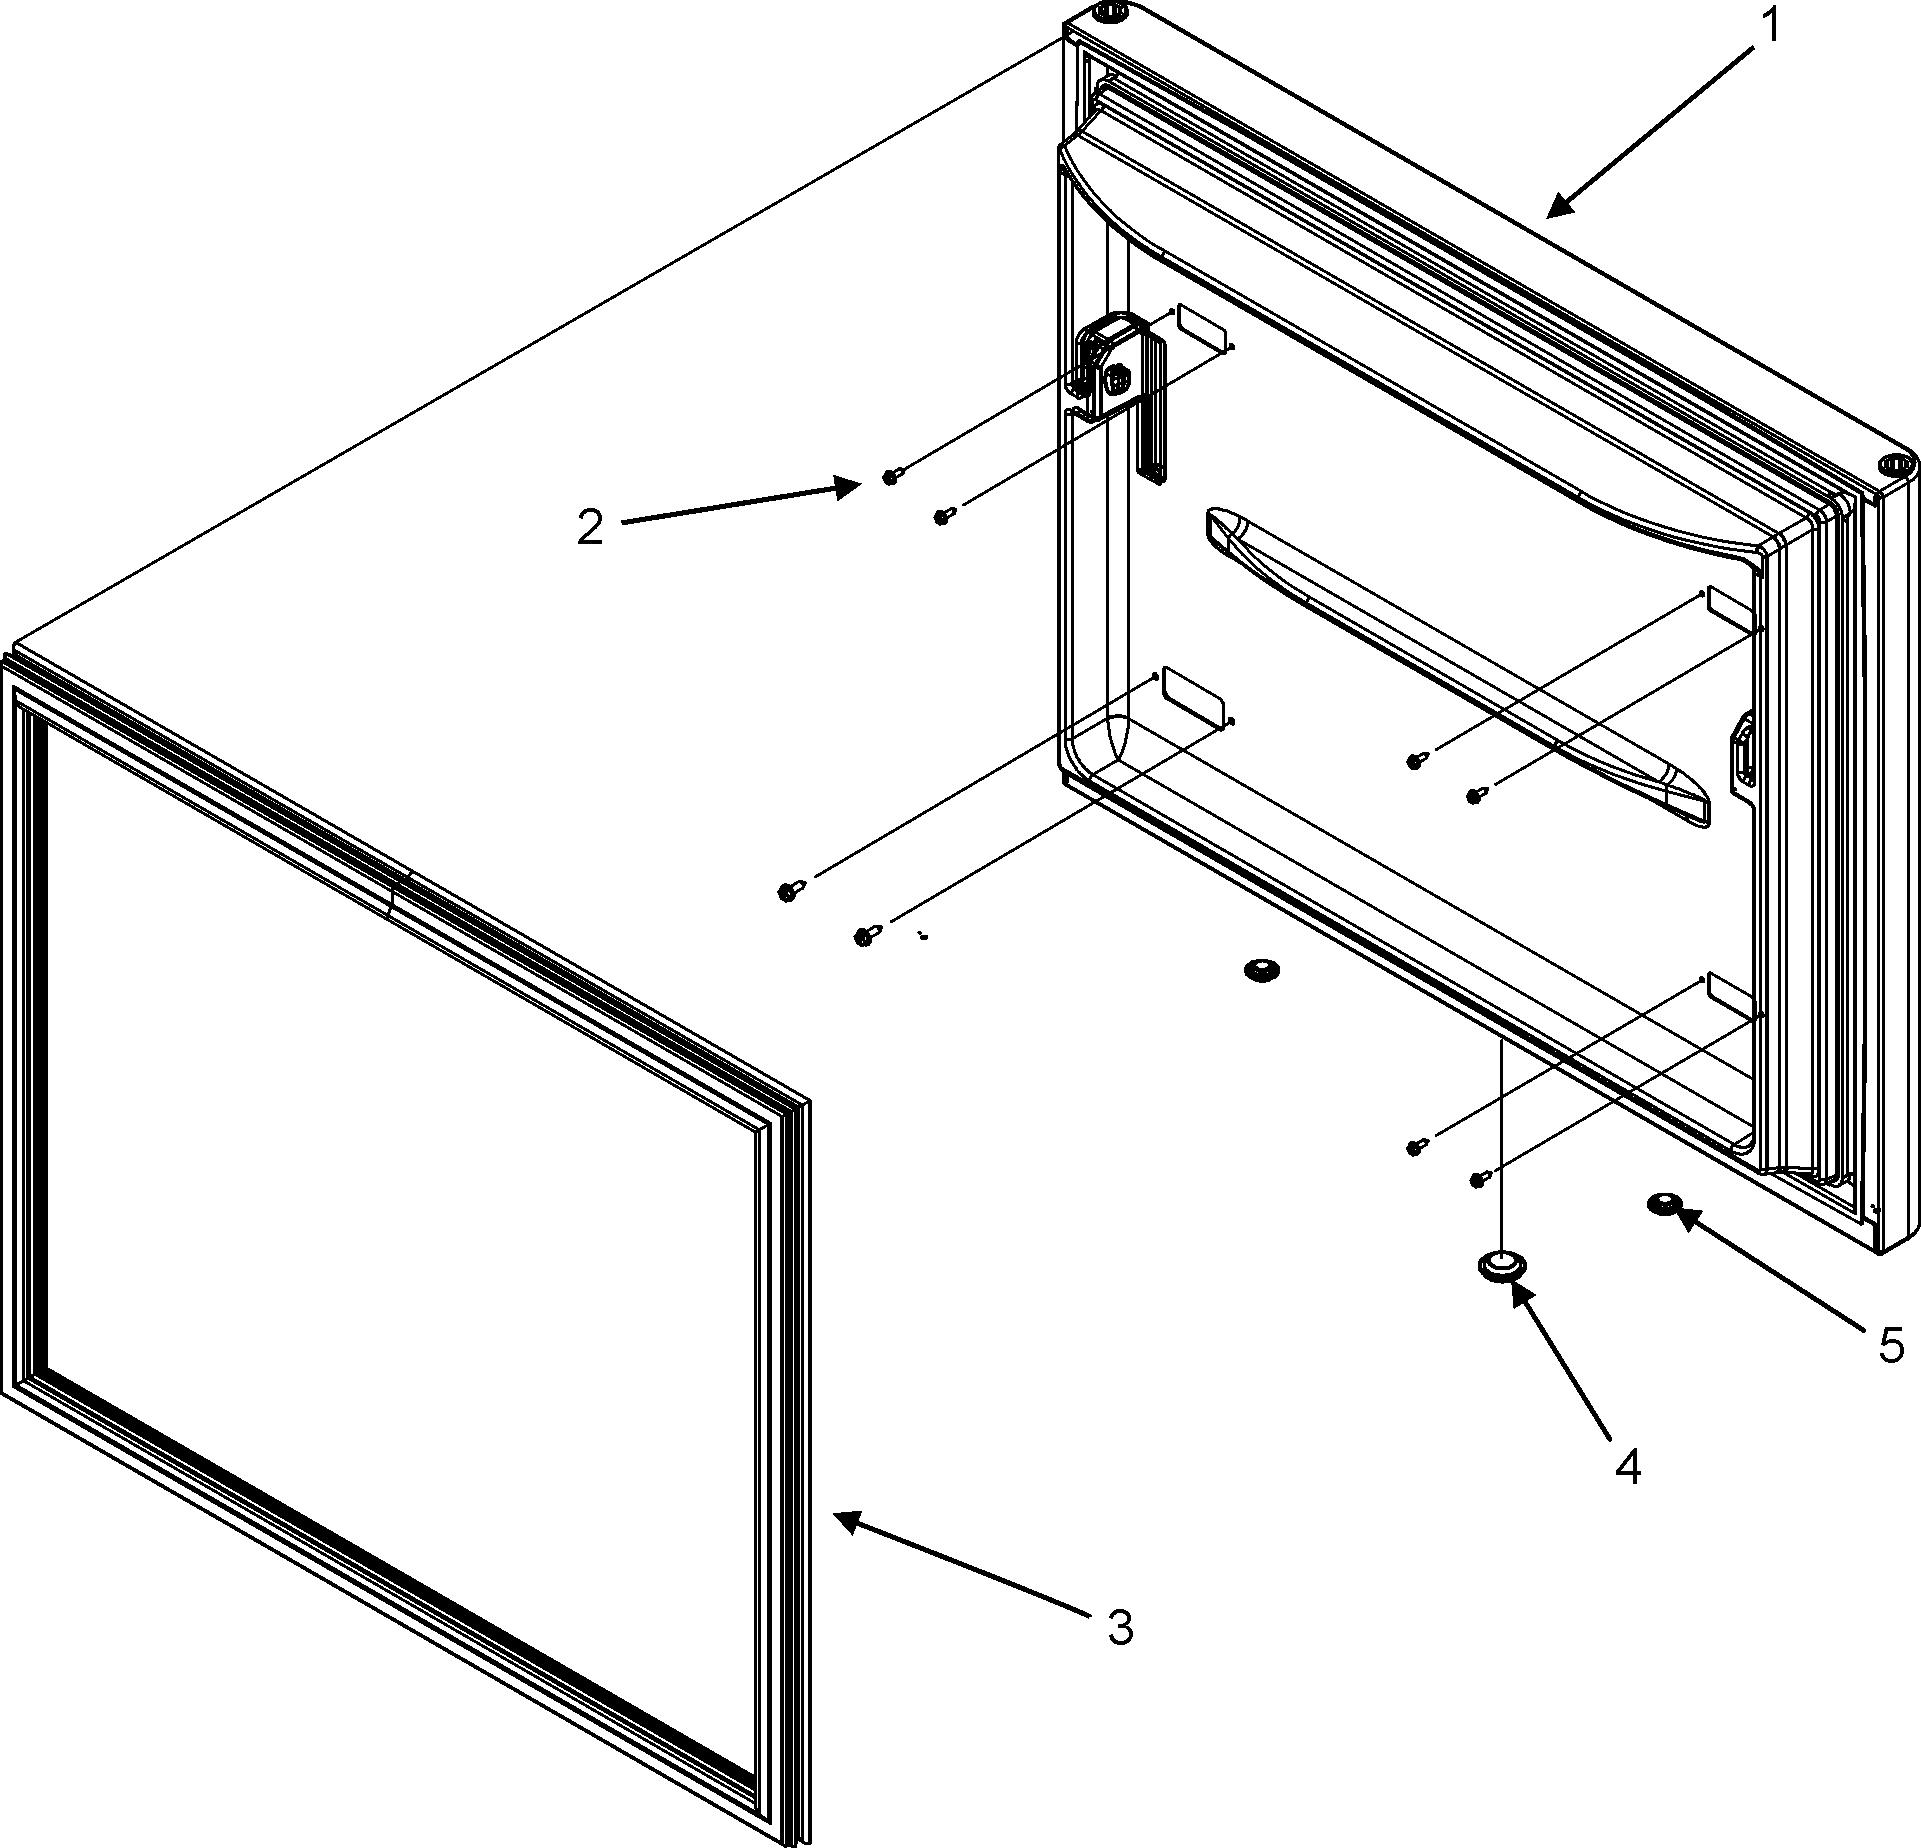 Jenn-Air model JFC2089HES bottom-mount refrigerator